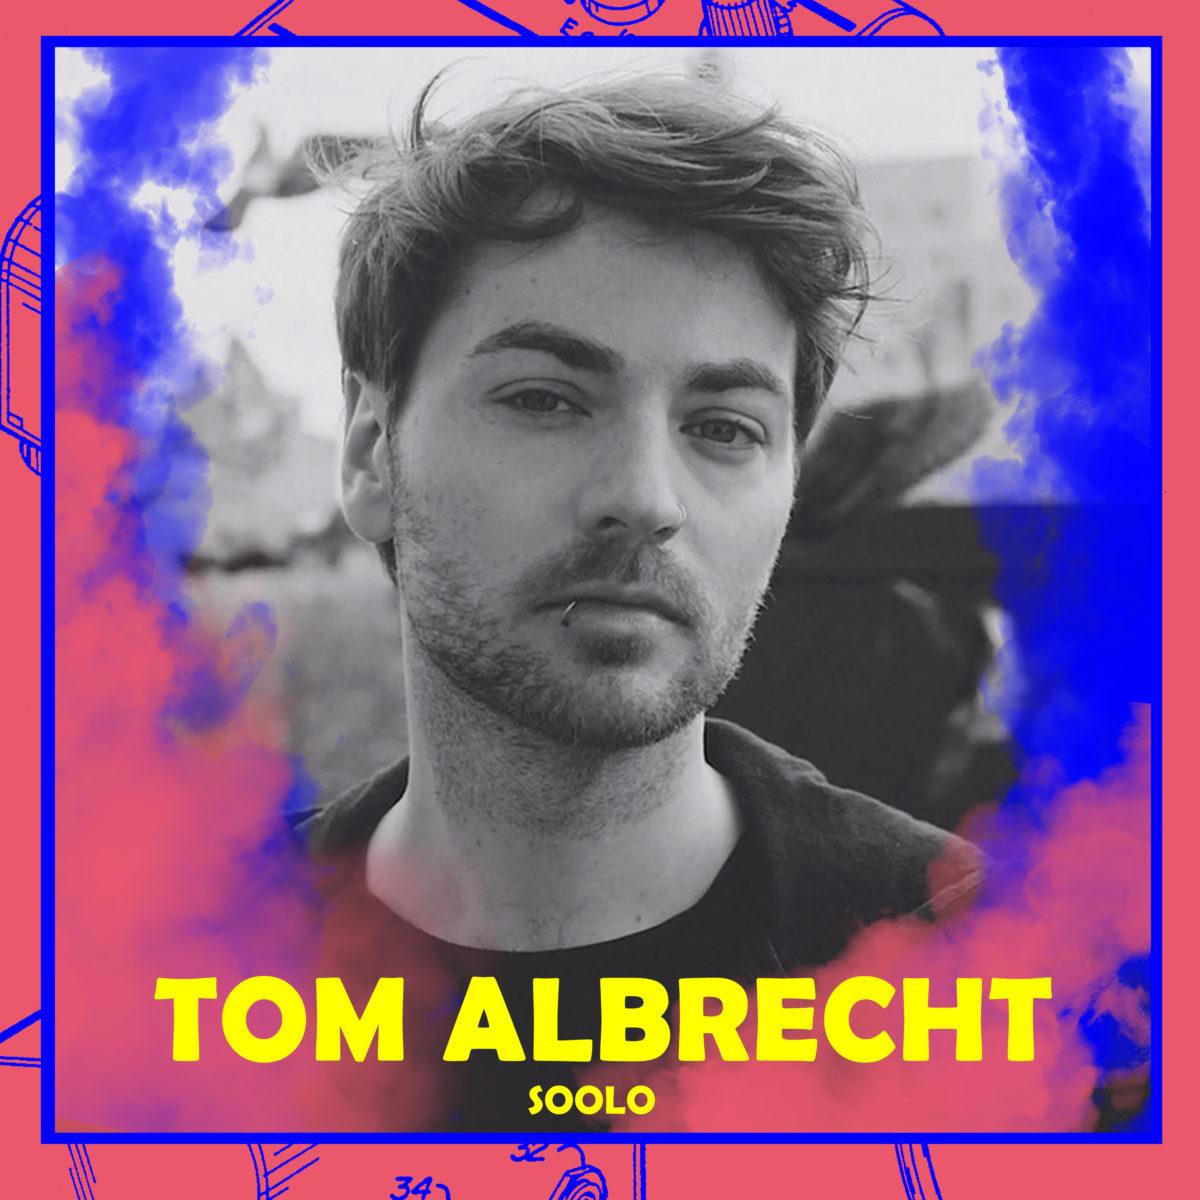 Tom Albrecht (Soolo)